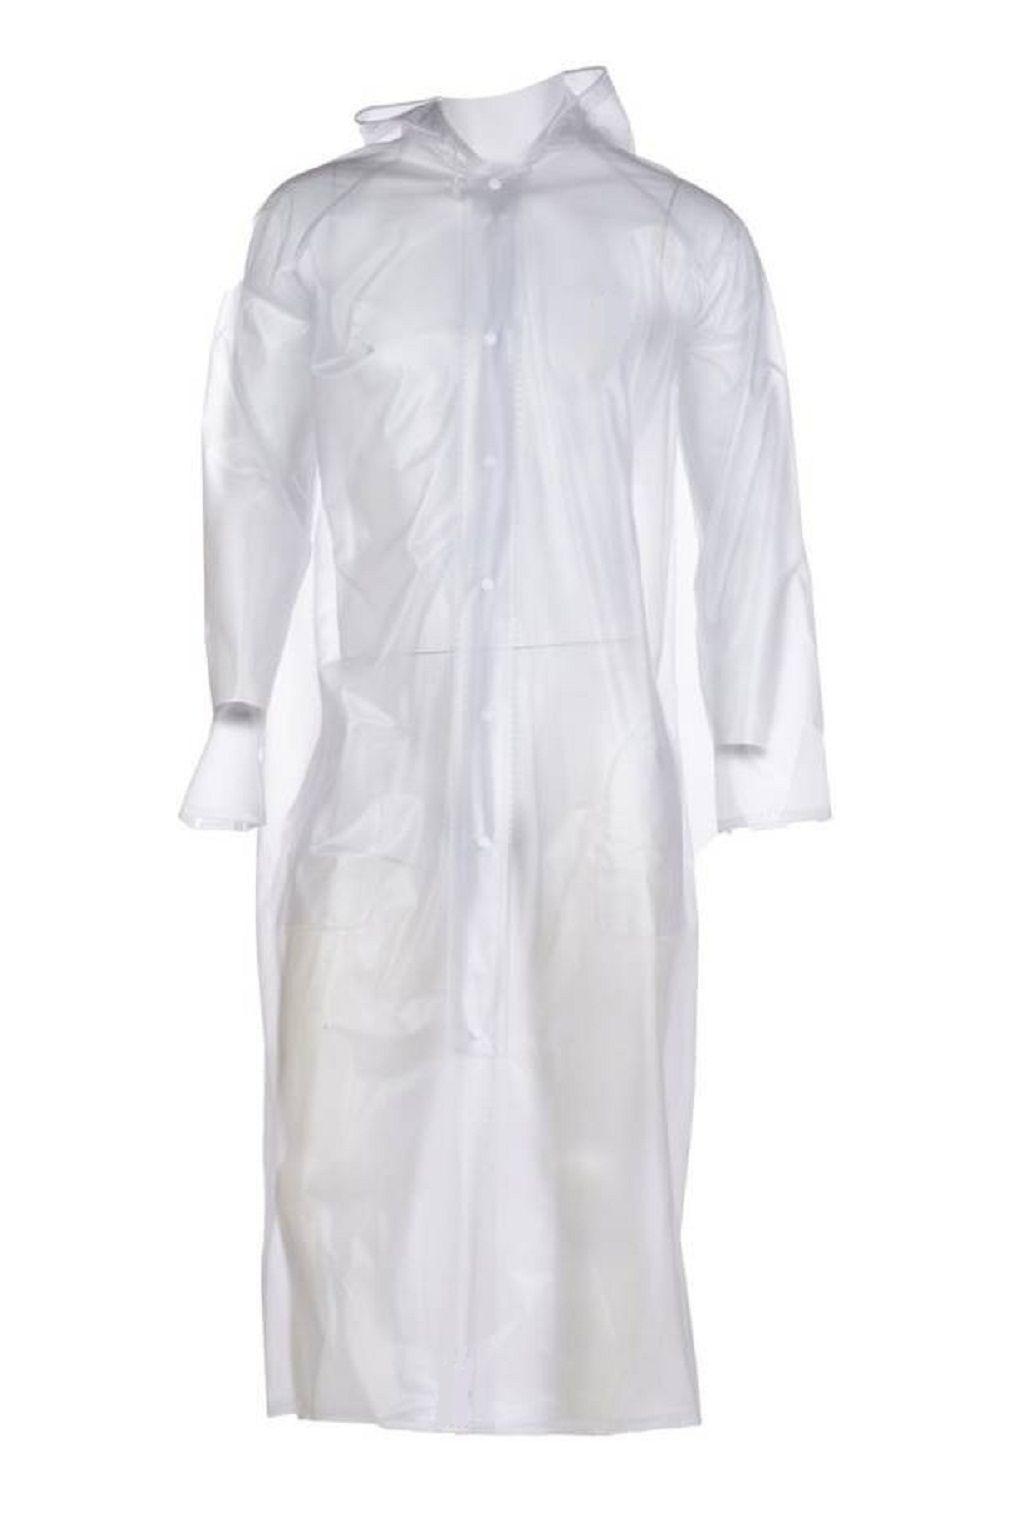 SPZ FASHION PVC Long Raincoat - White